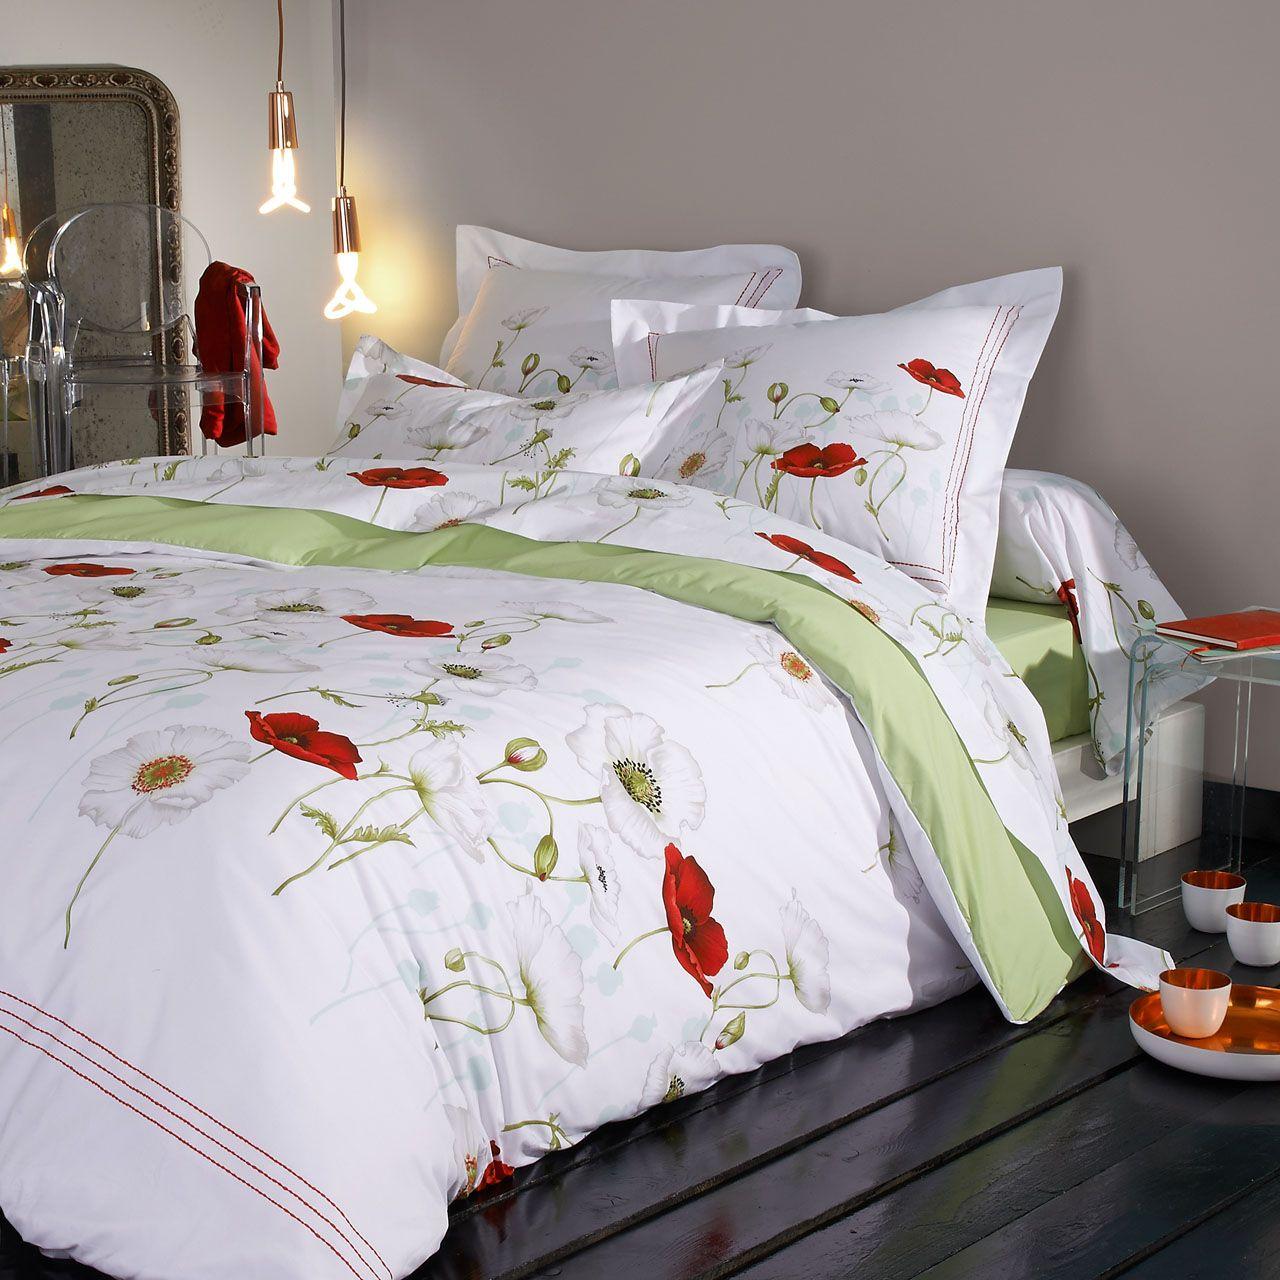 drap housse percale s duction 200x200 tradilinge. Black Bedroom Furniture Sets. Home Design Ideas